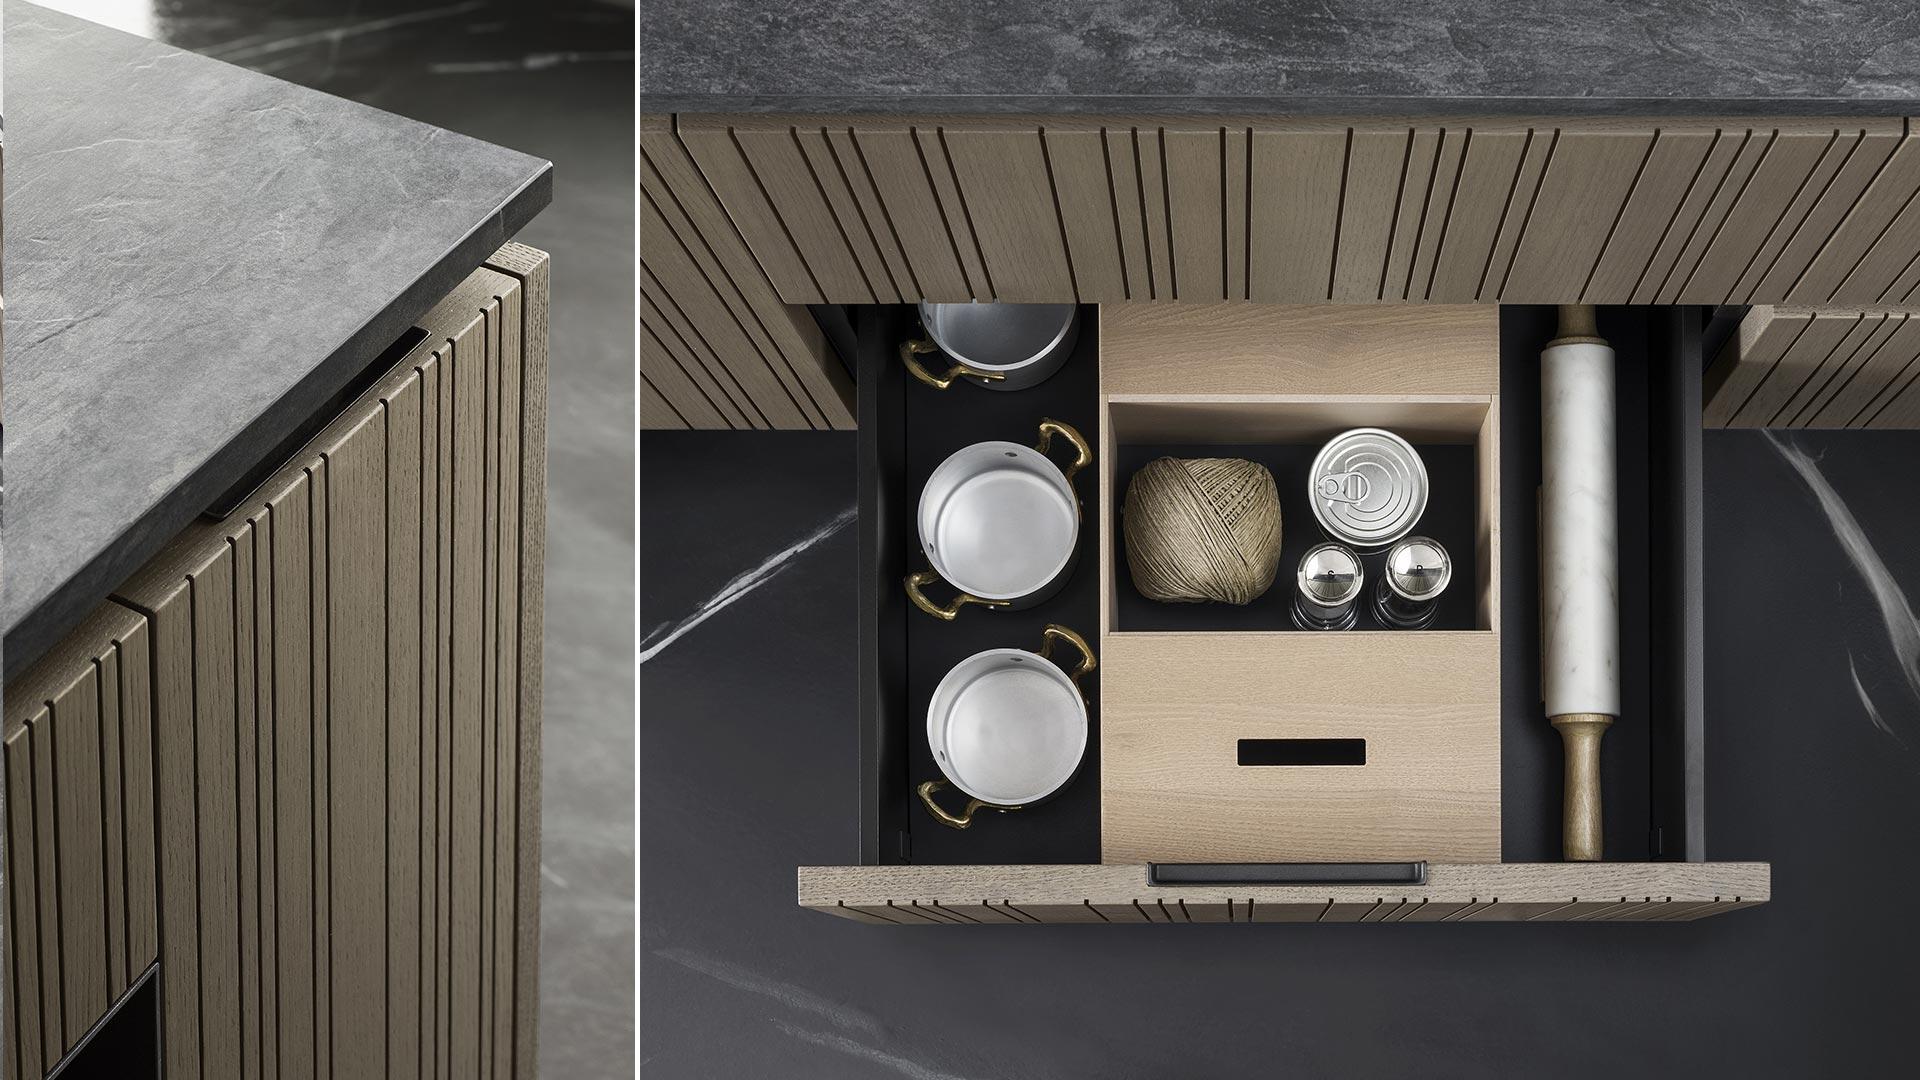 Design kitchen, wood kitchen - Collection RUA - TM_MI2018_Rua_003